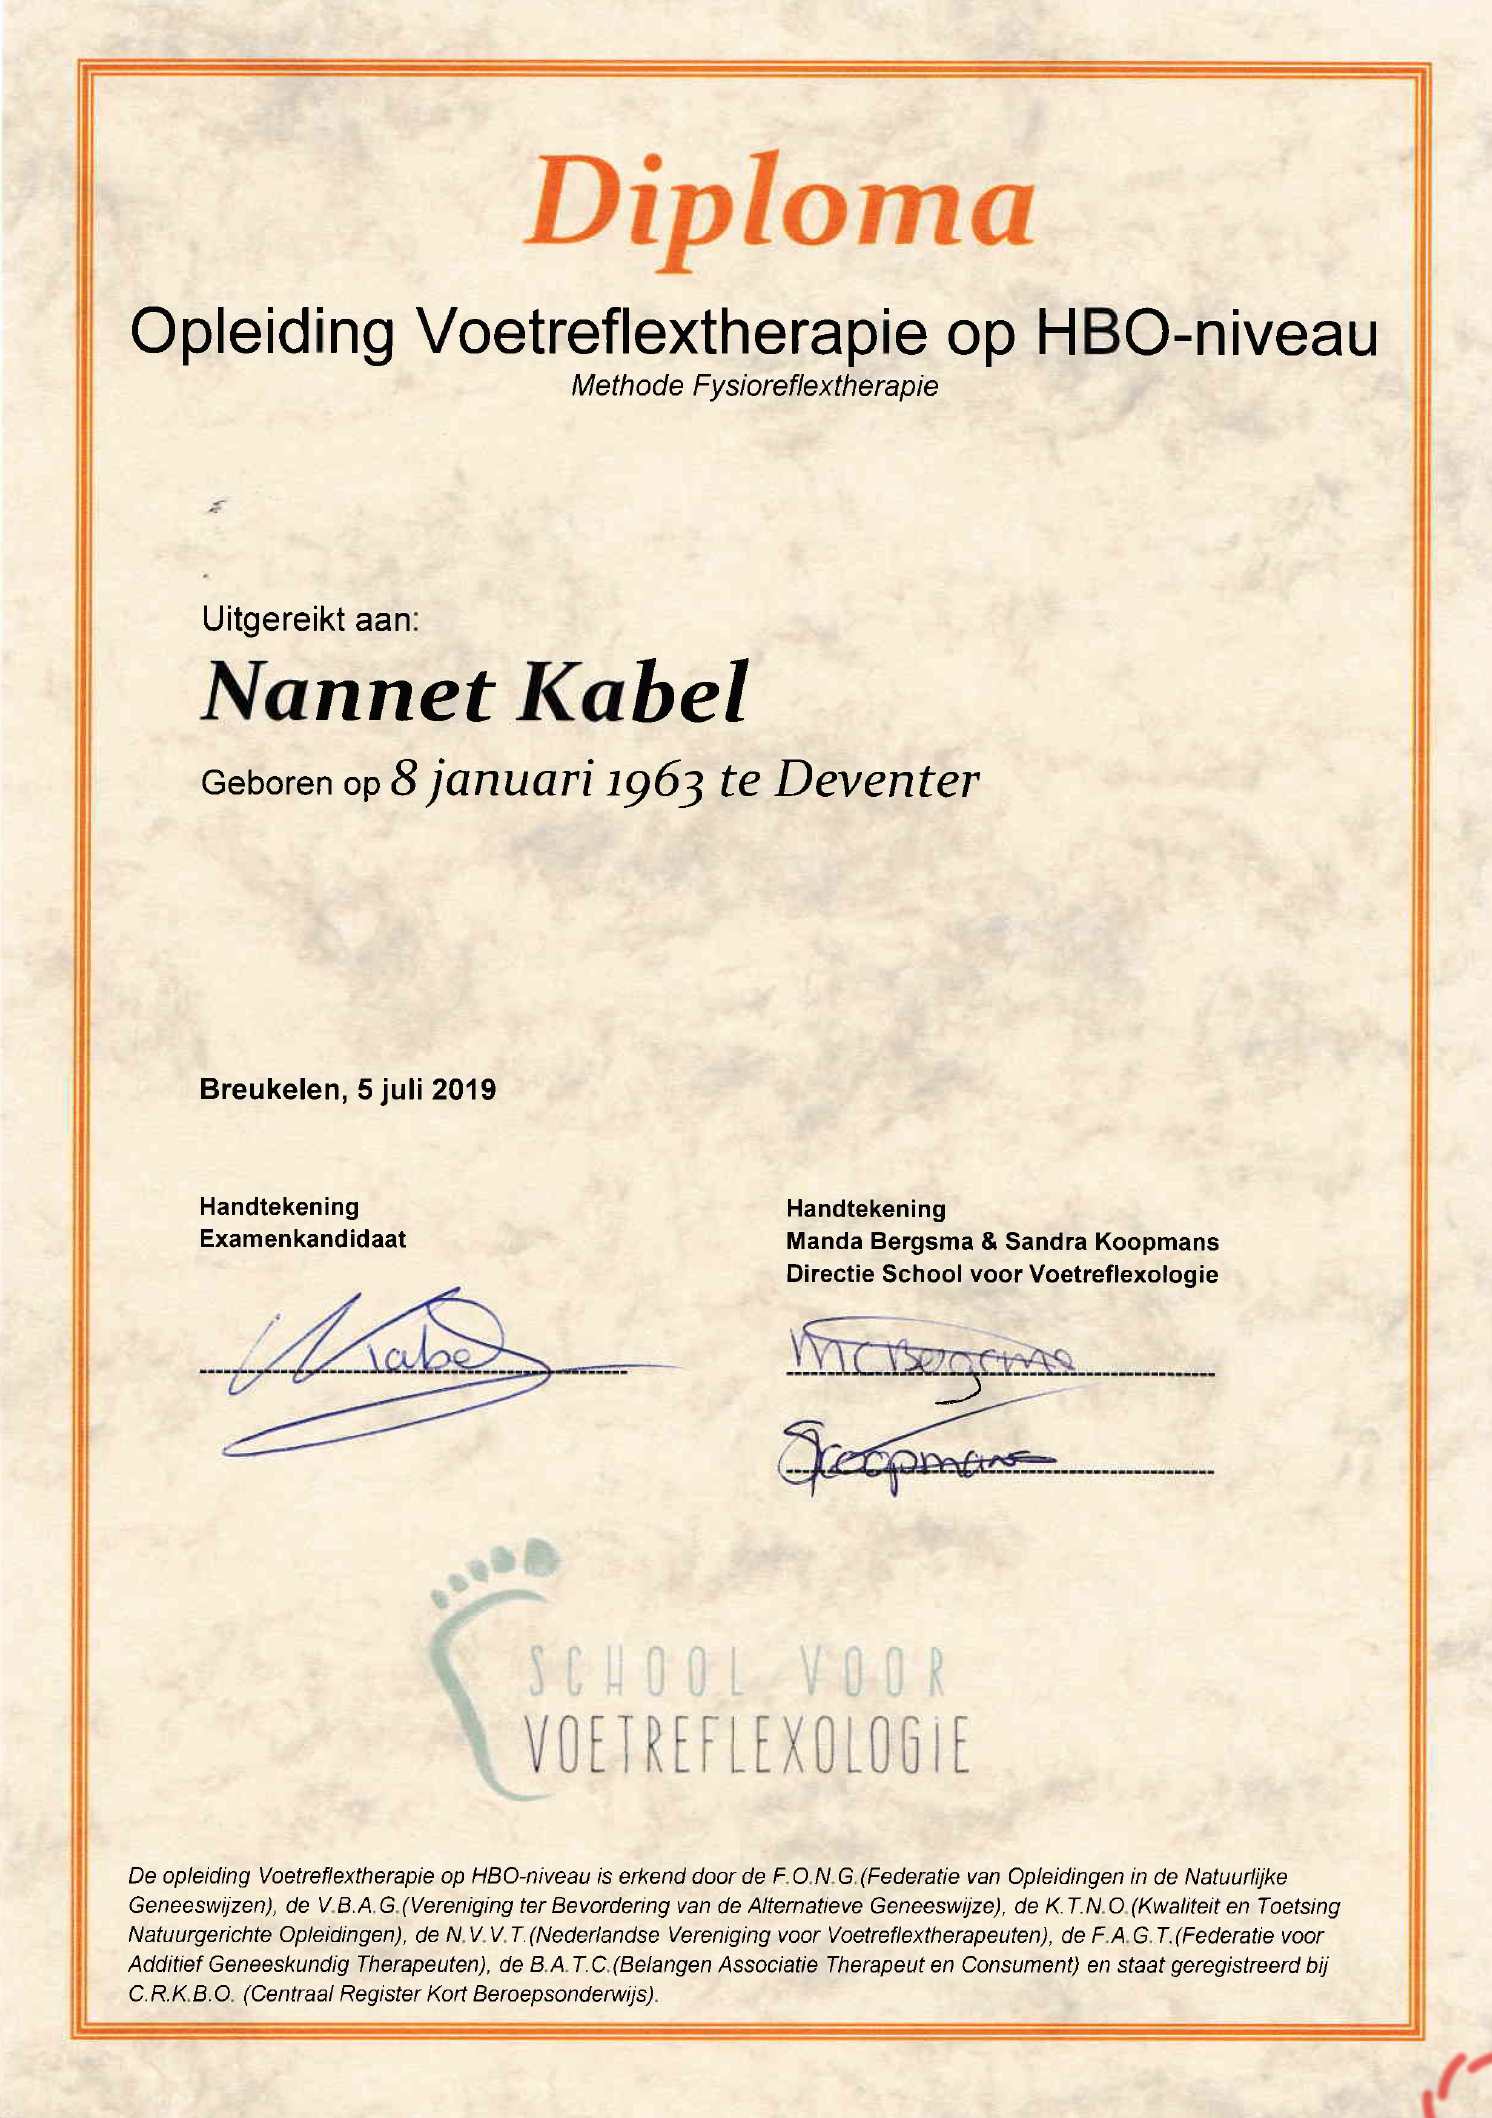 Nannet Kabel Diploma Opleiding Voetreflextherapie HBO